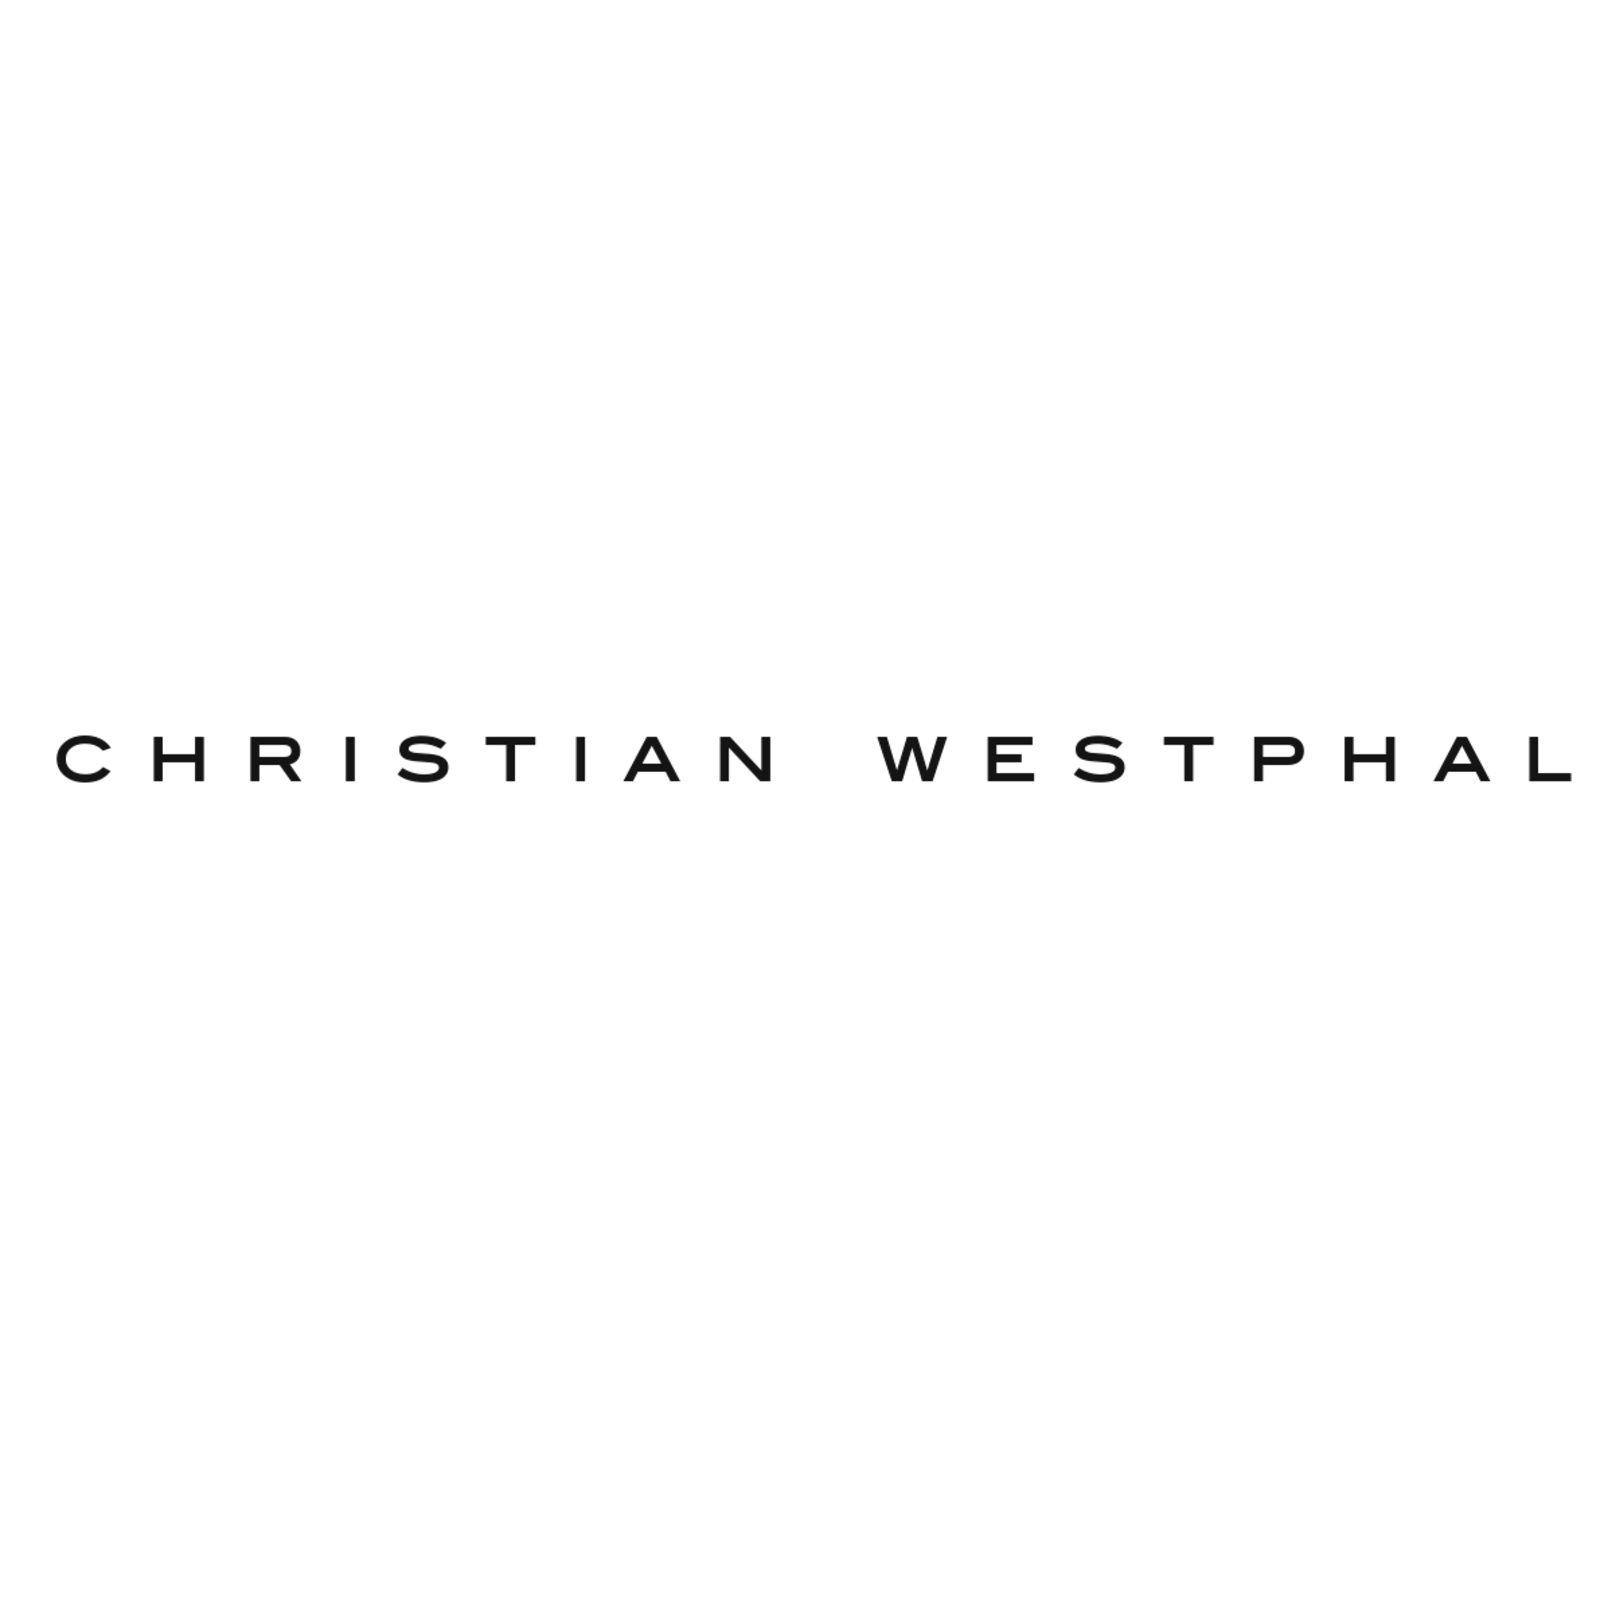 CHRISTIAN WESTPHAL (Bild 1)